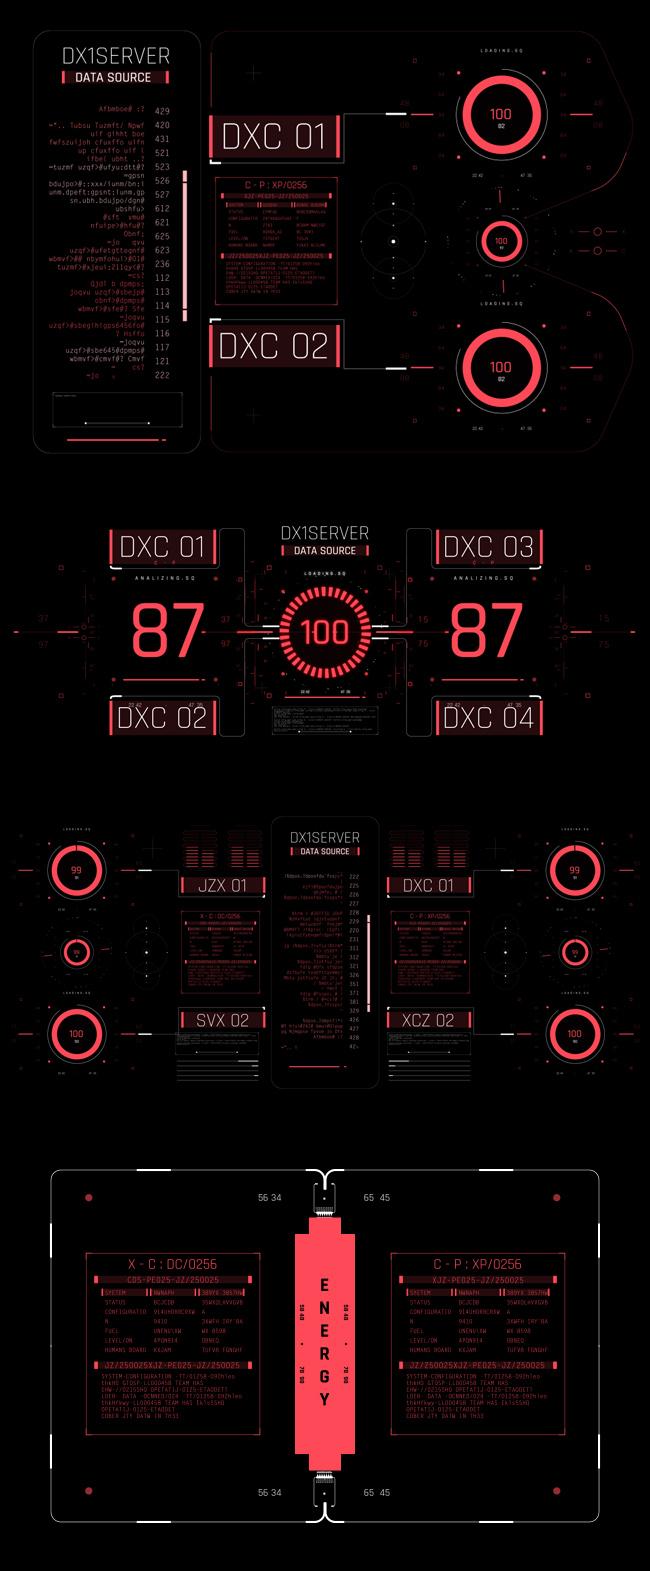 AE脚本-500个HUD高科技赛博朋克UI科幻界面元素动画预设包 Cyberpunk HUD UI 500+ 已修复中文版AE表达式报错插图33